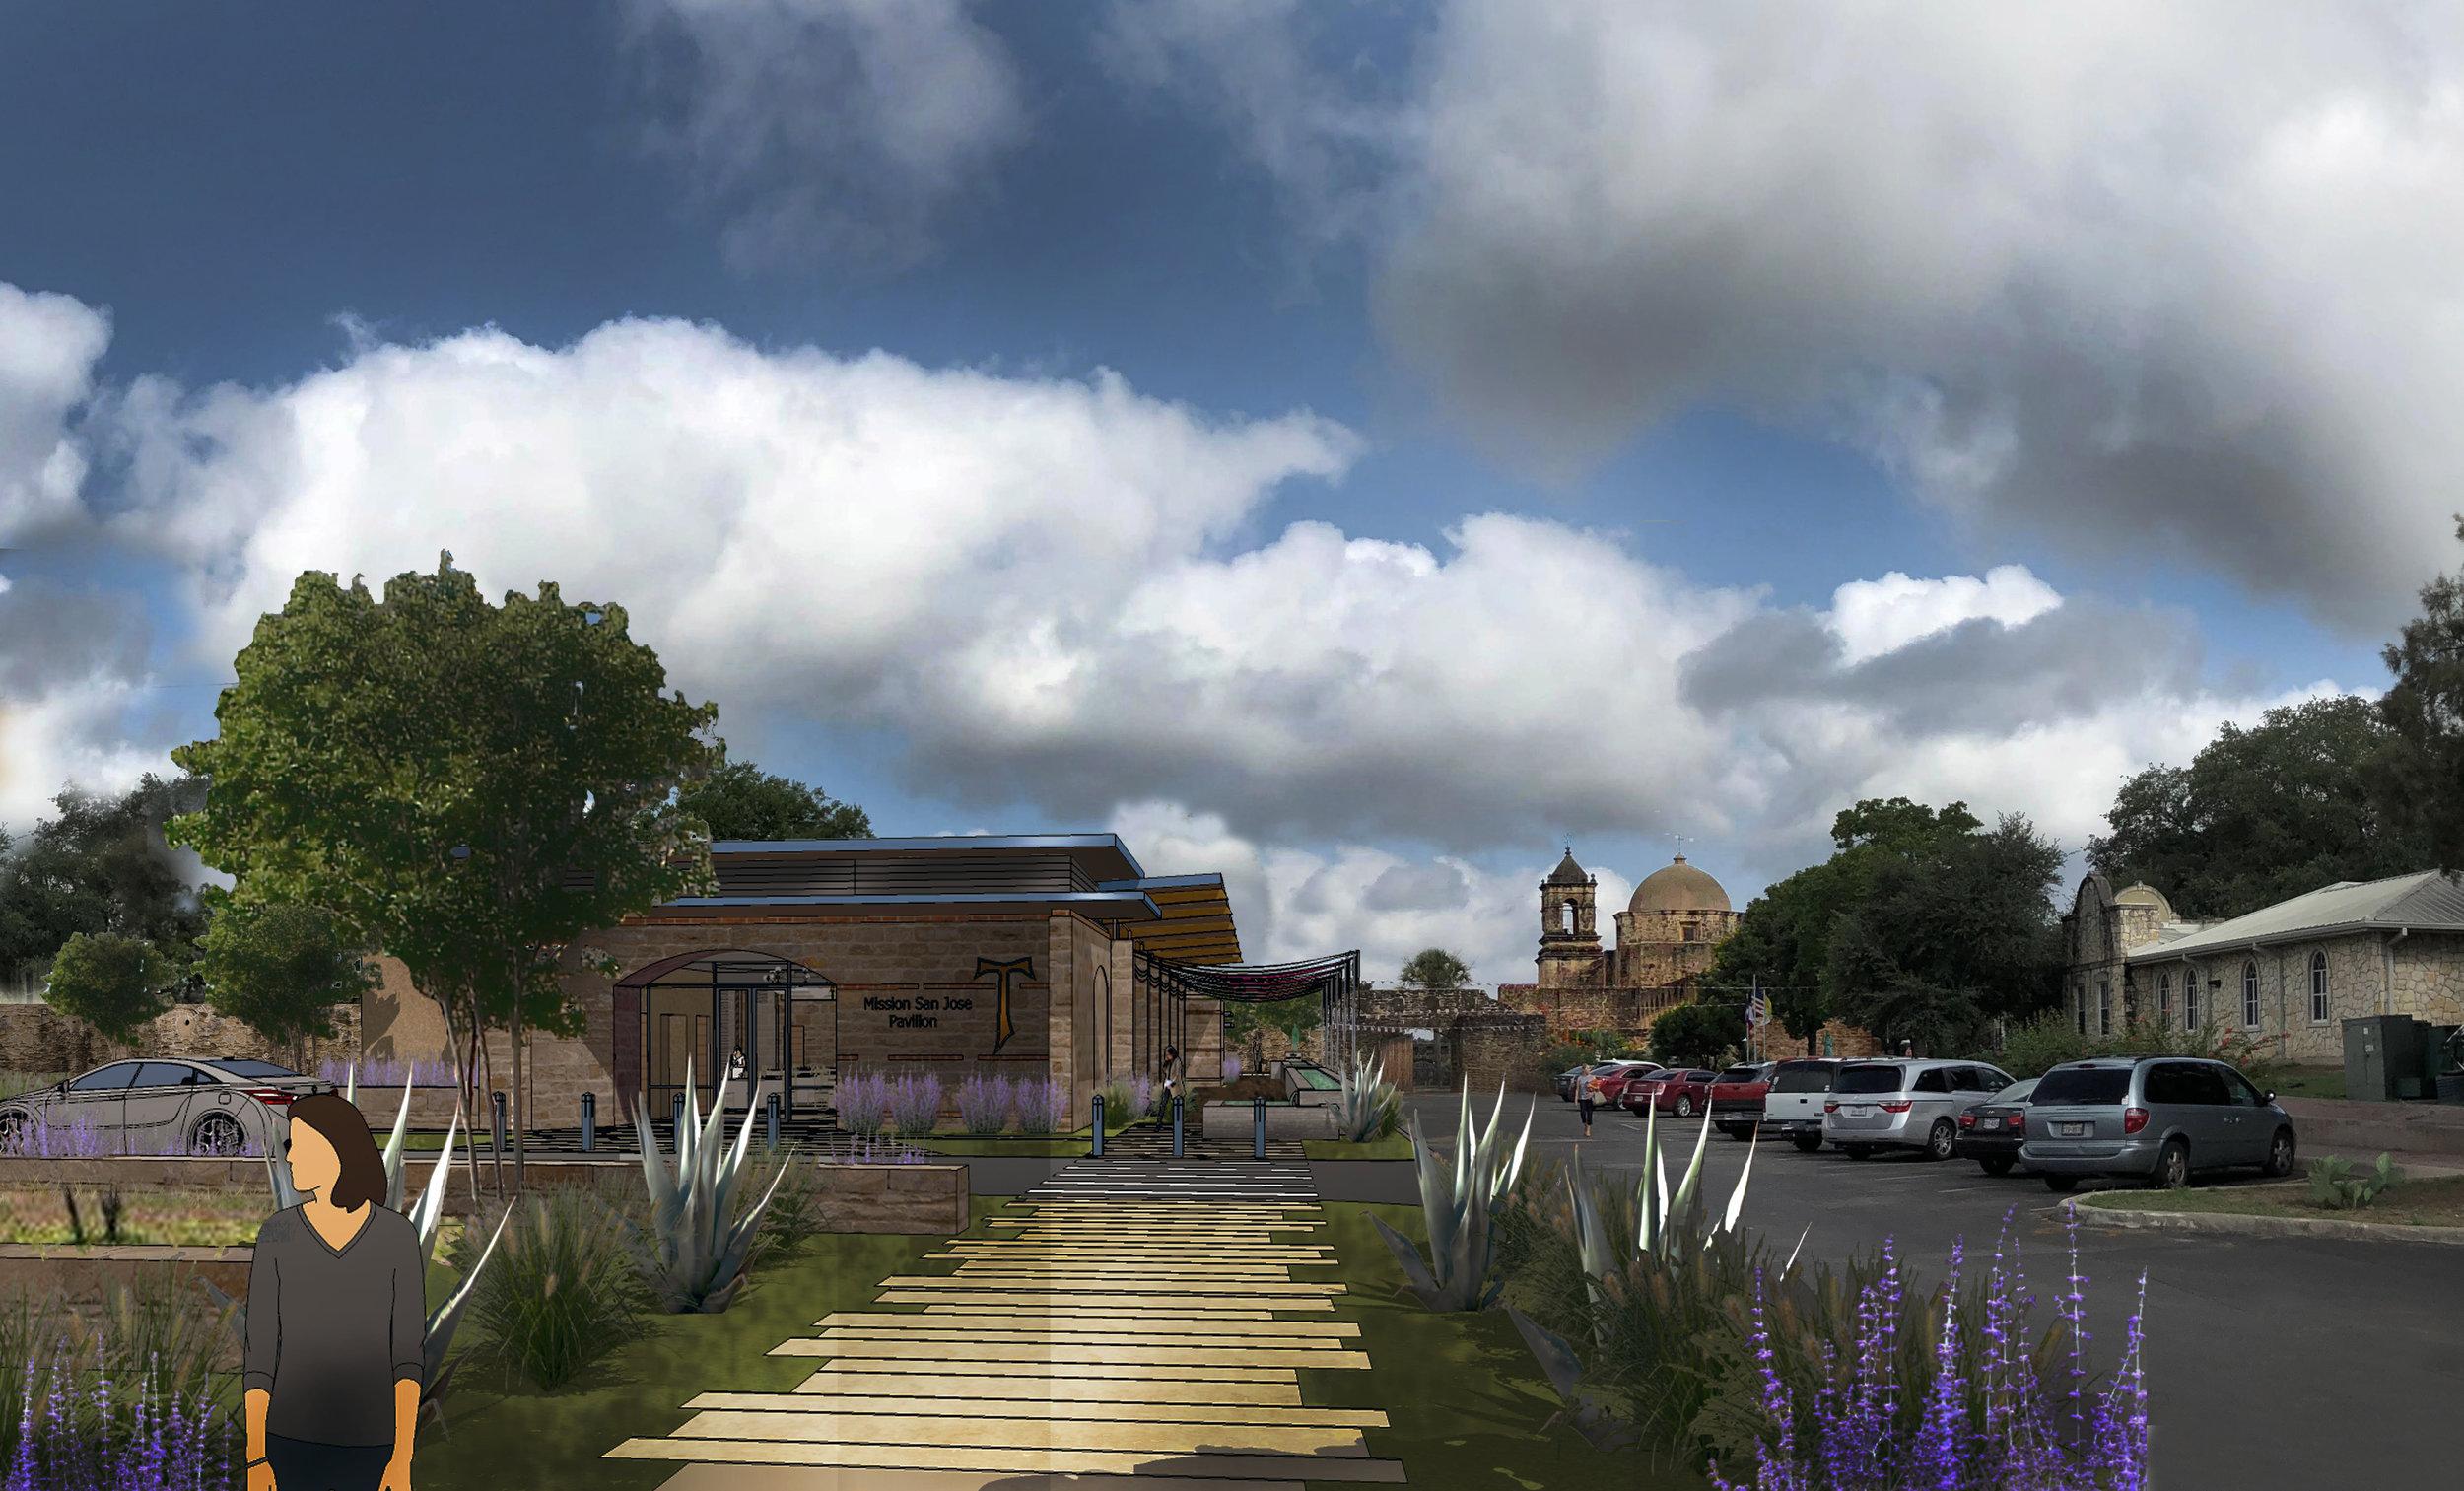 Mission San Jose Pavilion - 701 E. Pyron Ave.San Antonio, TX 78214